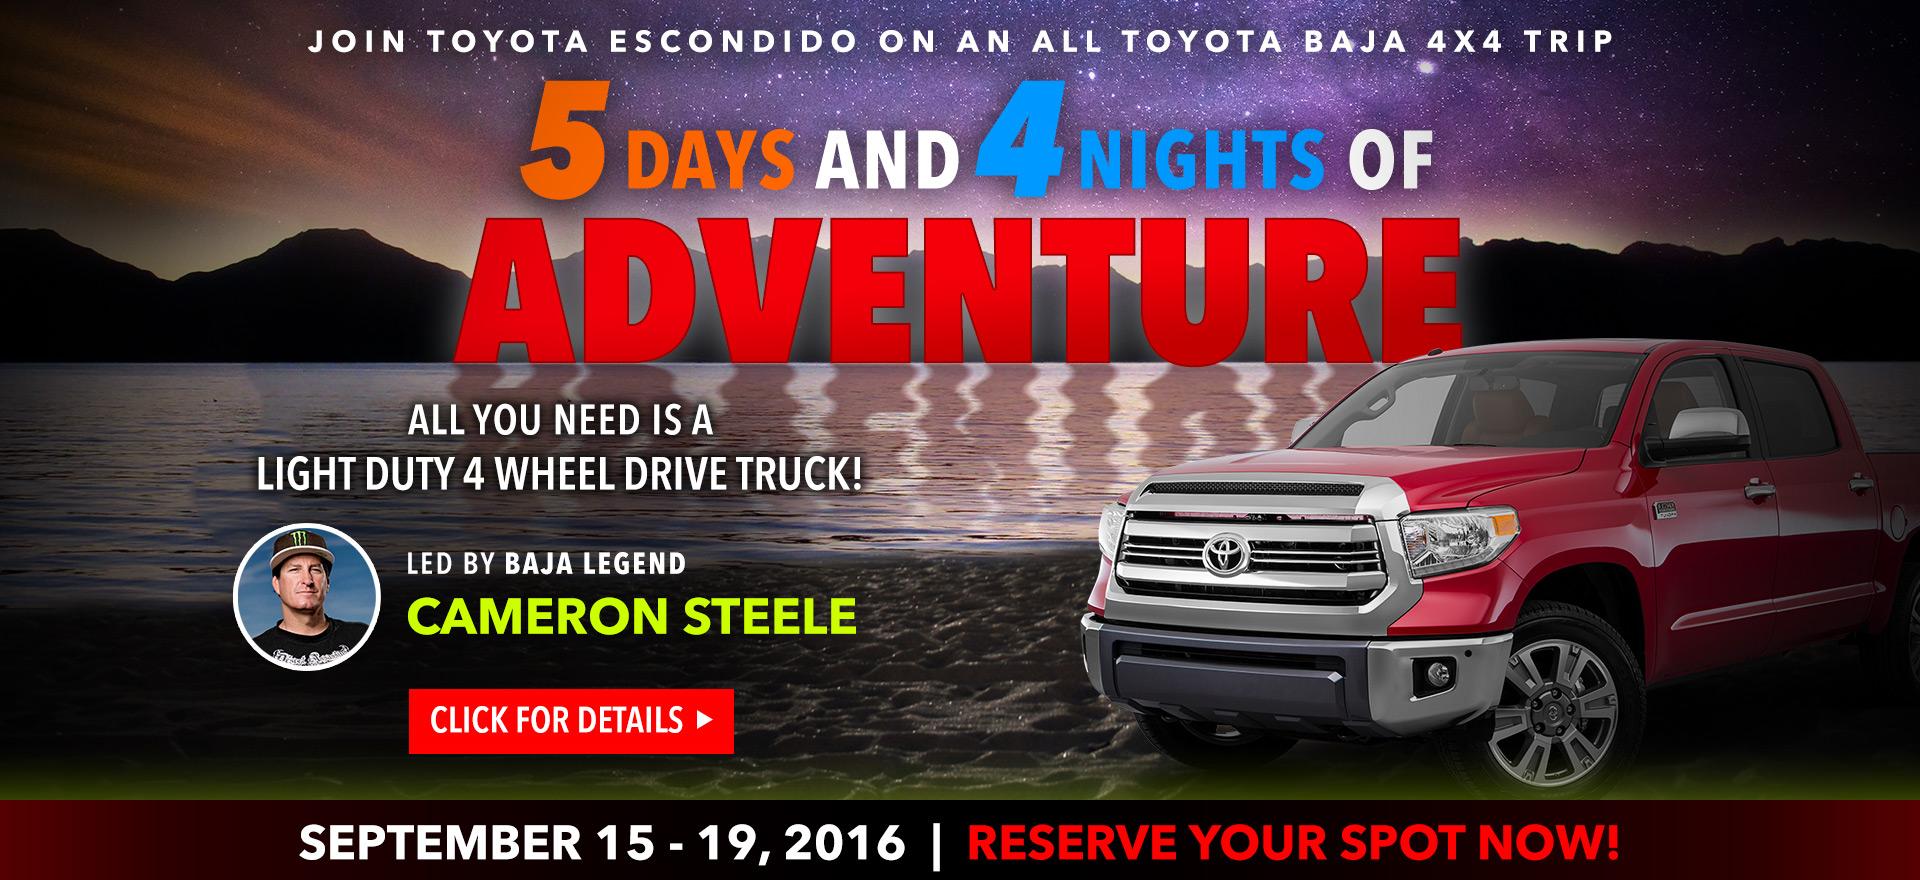 Toyota Escondido: Full Moon Baja Adventure!